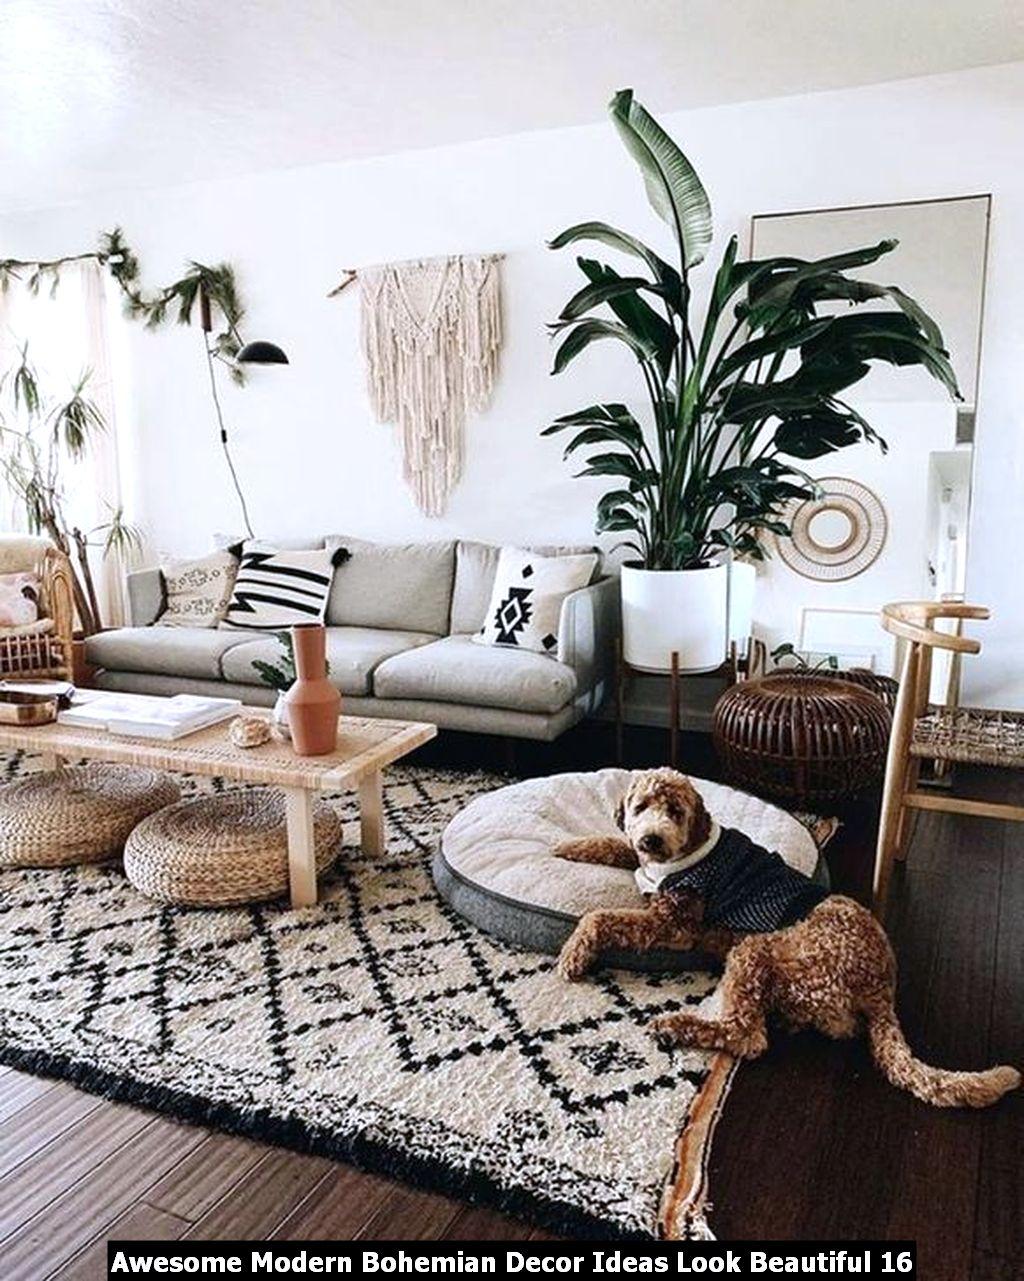 Awesome Modern Bohemian Decor Ideas Look Beautiful 16